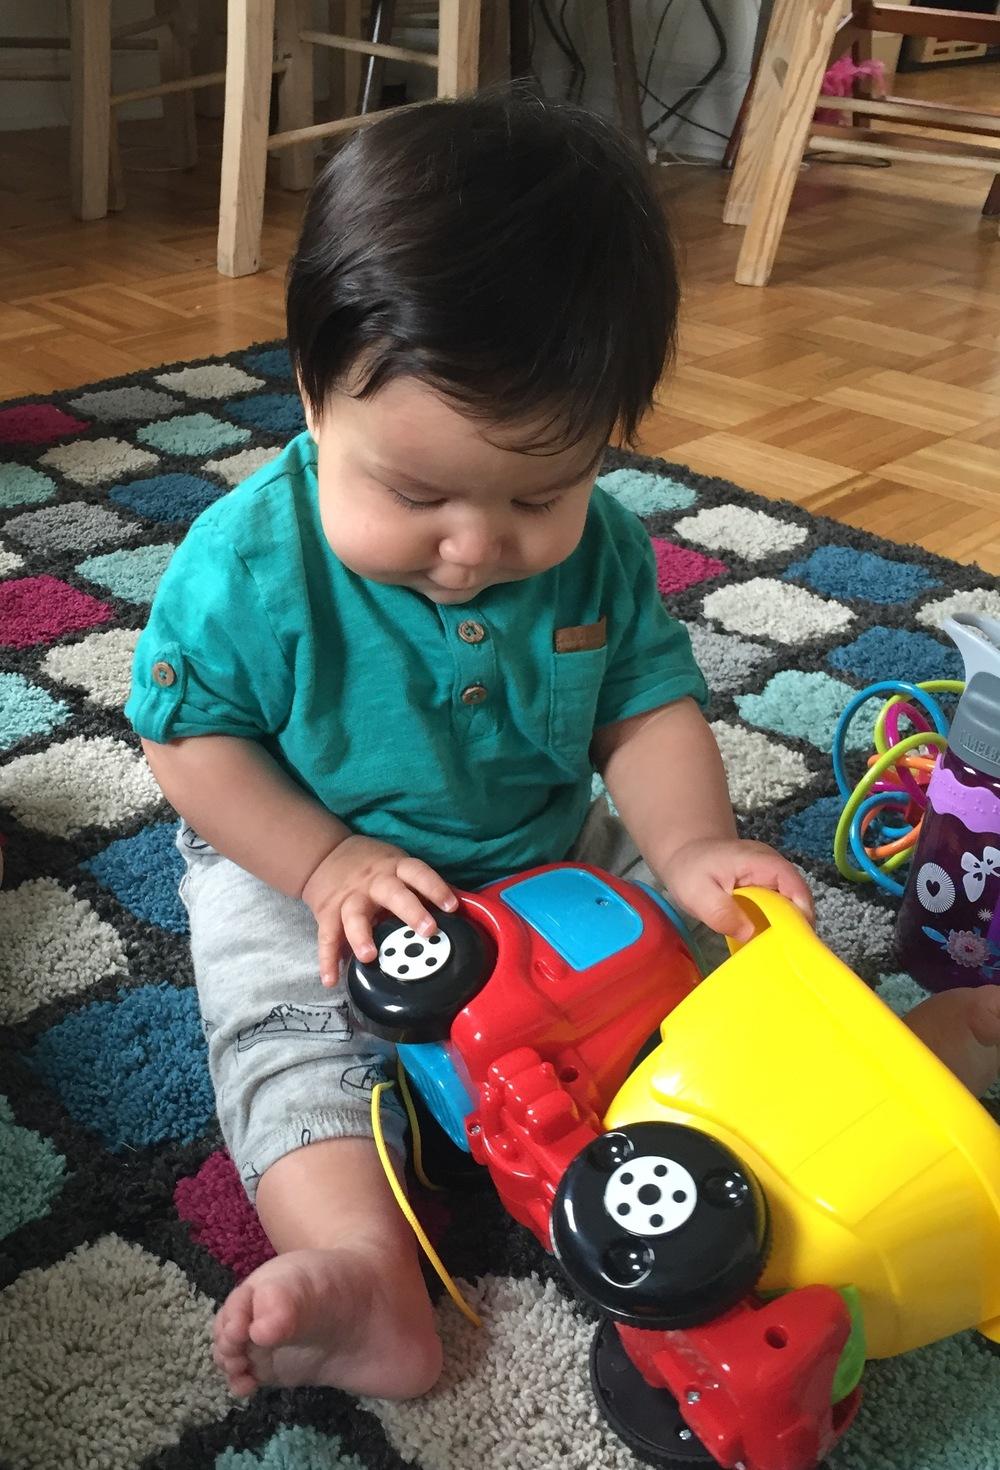 A boy & his truck